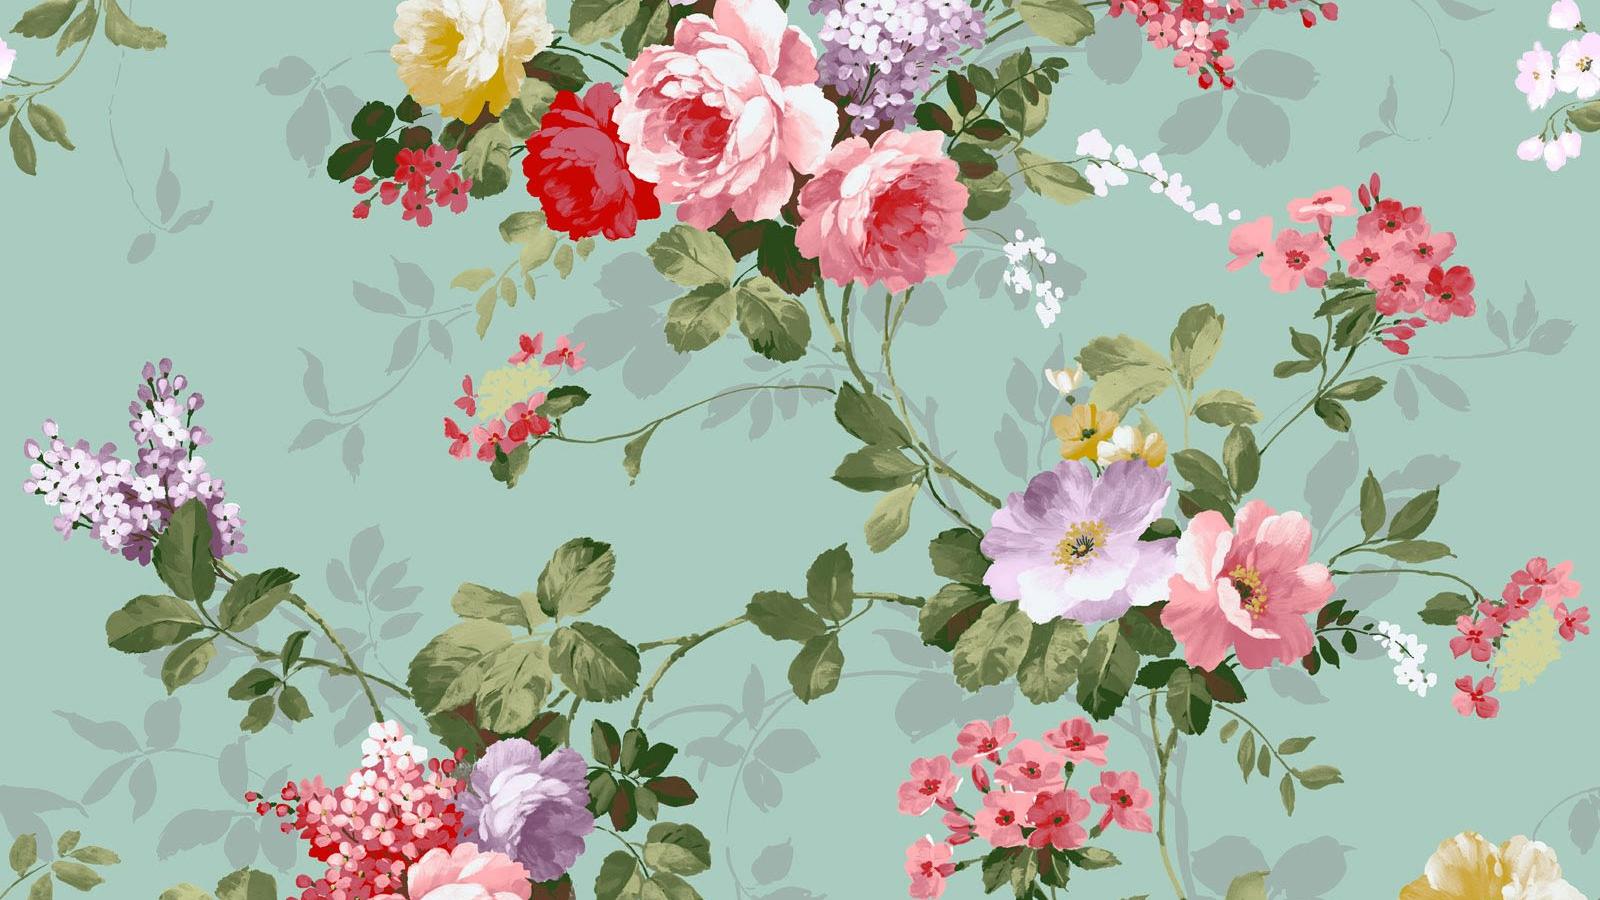 Free Download Download Classic Floral Vintage Design Wallpaper